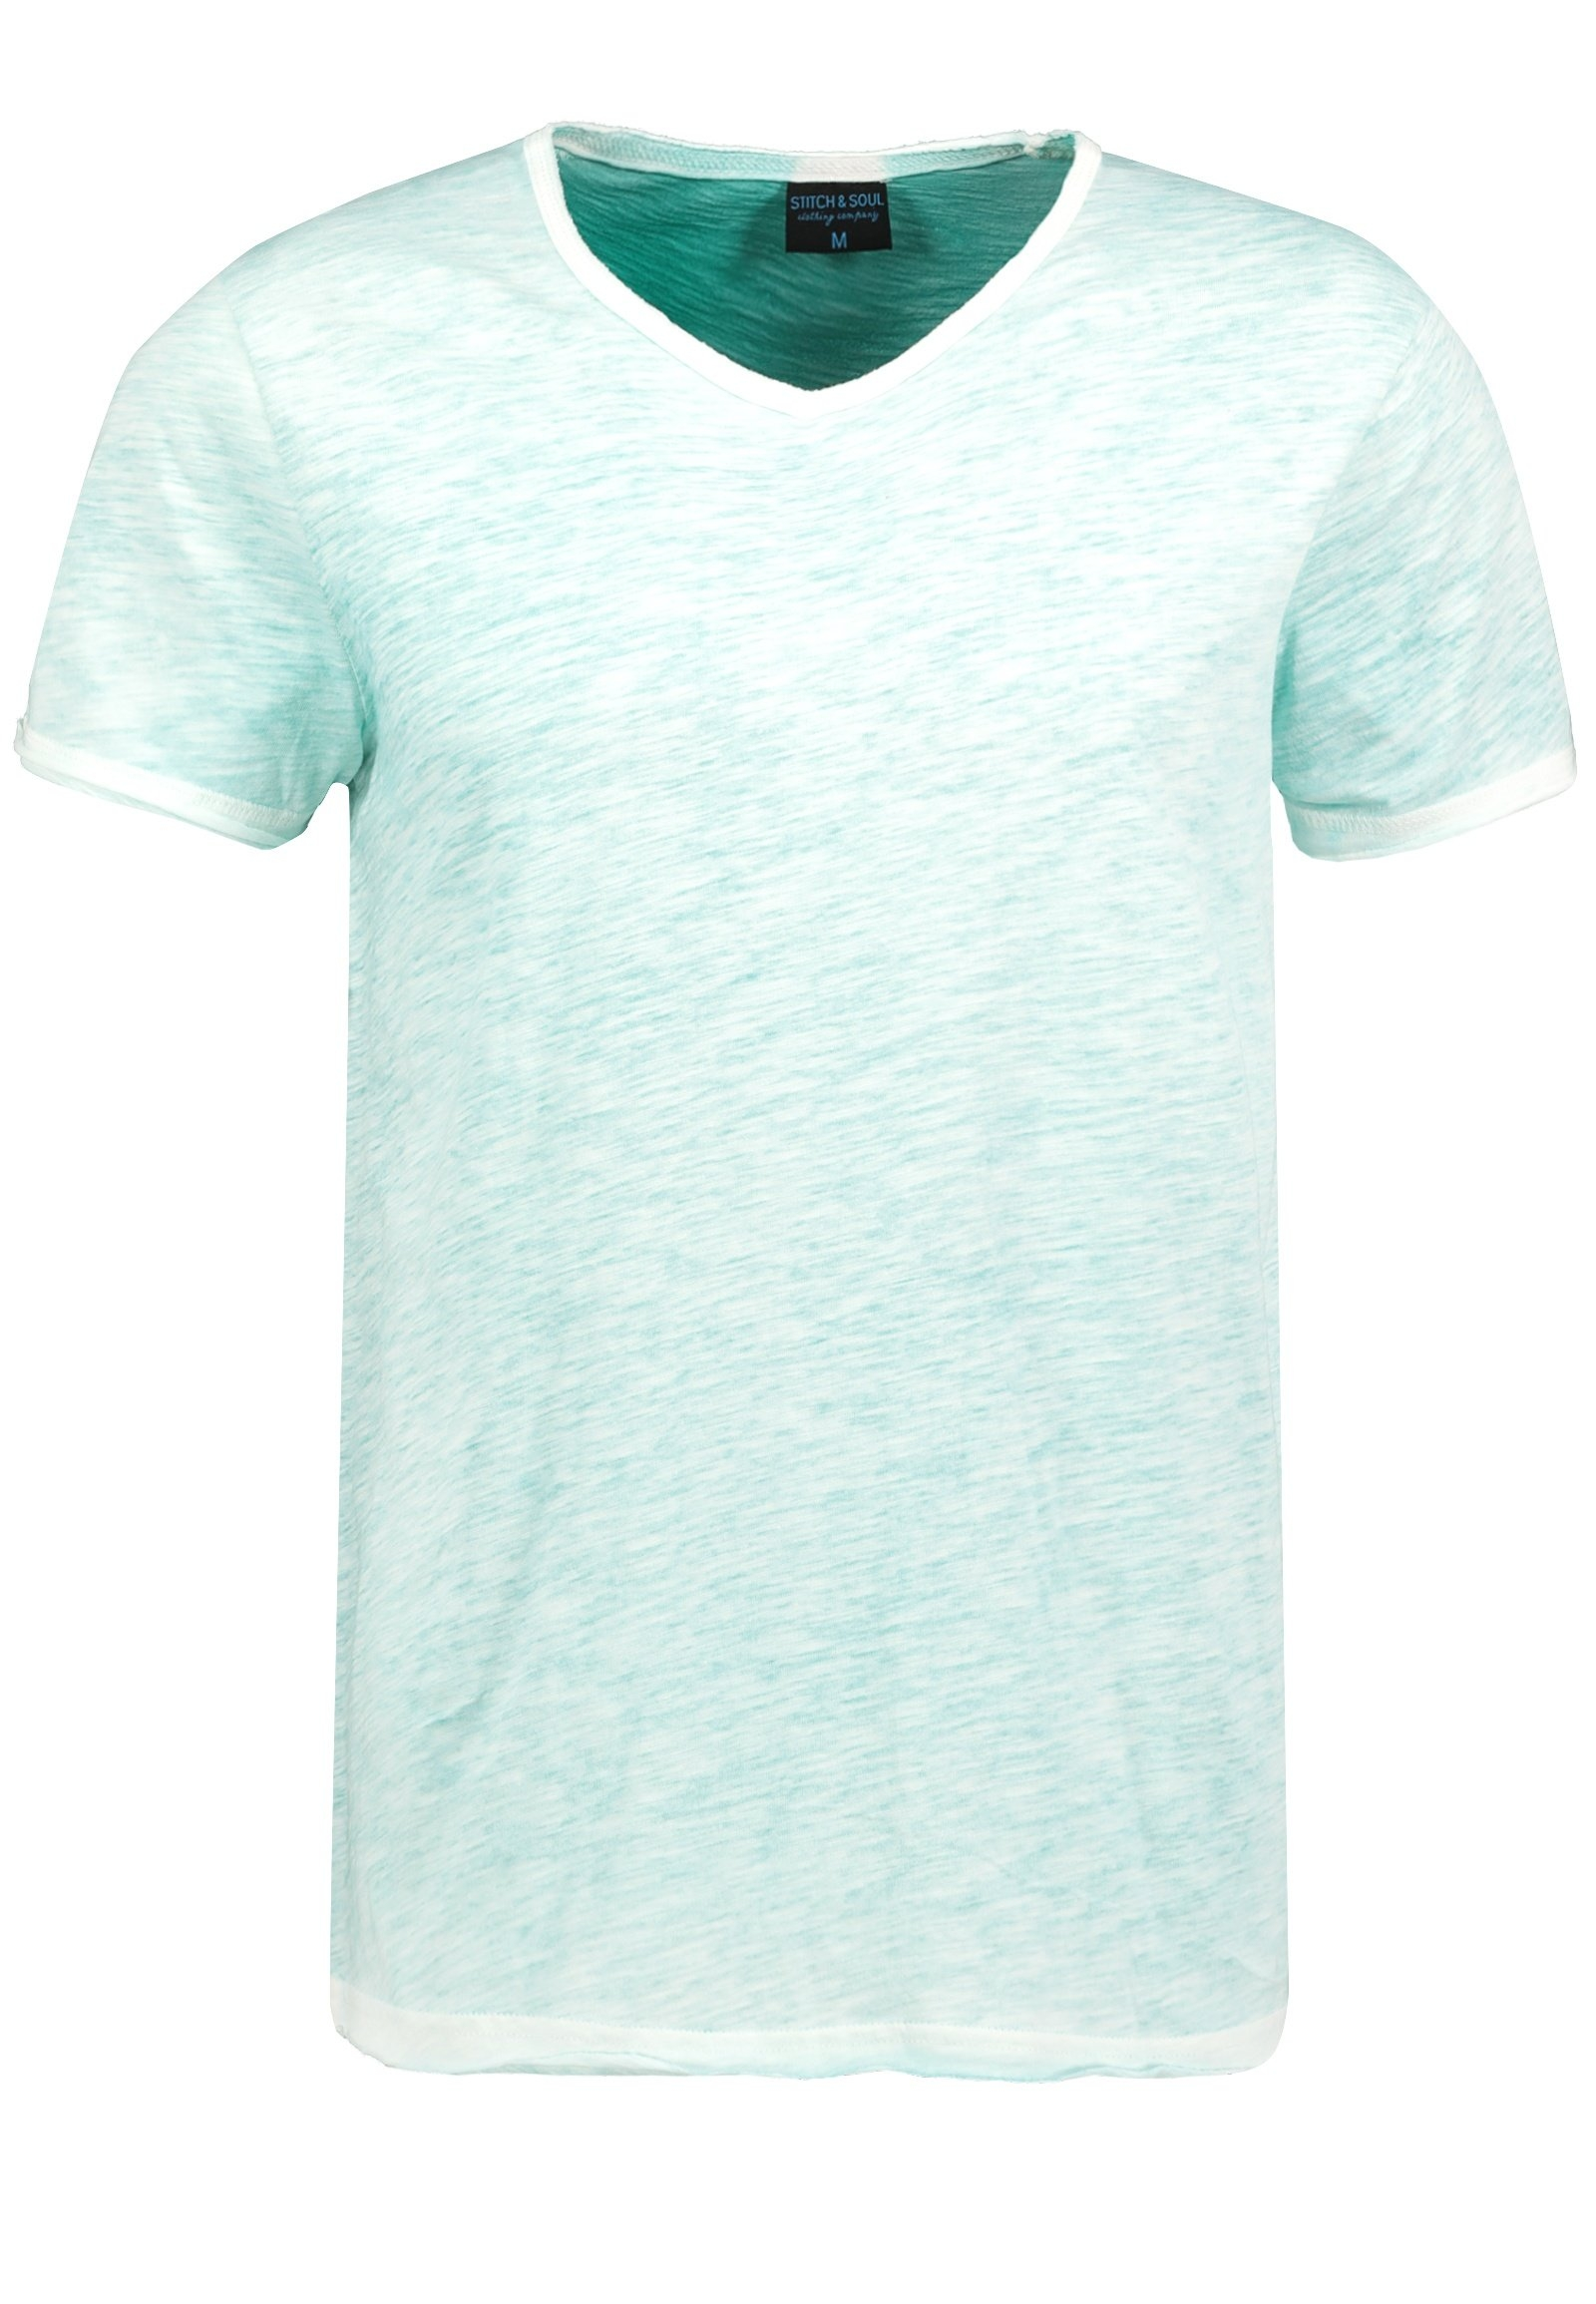 Stitch & Soul shirt met V-hals - gratis ruilen op otto.nl